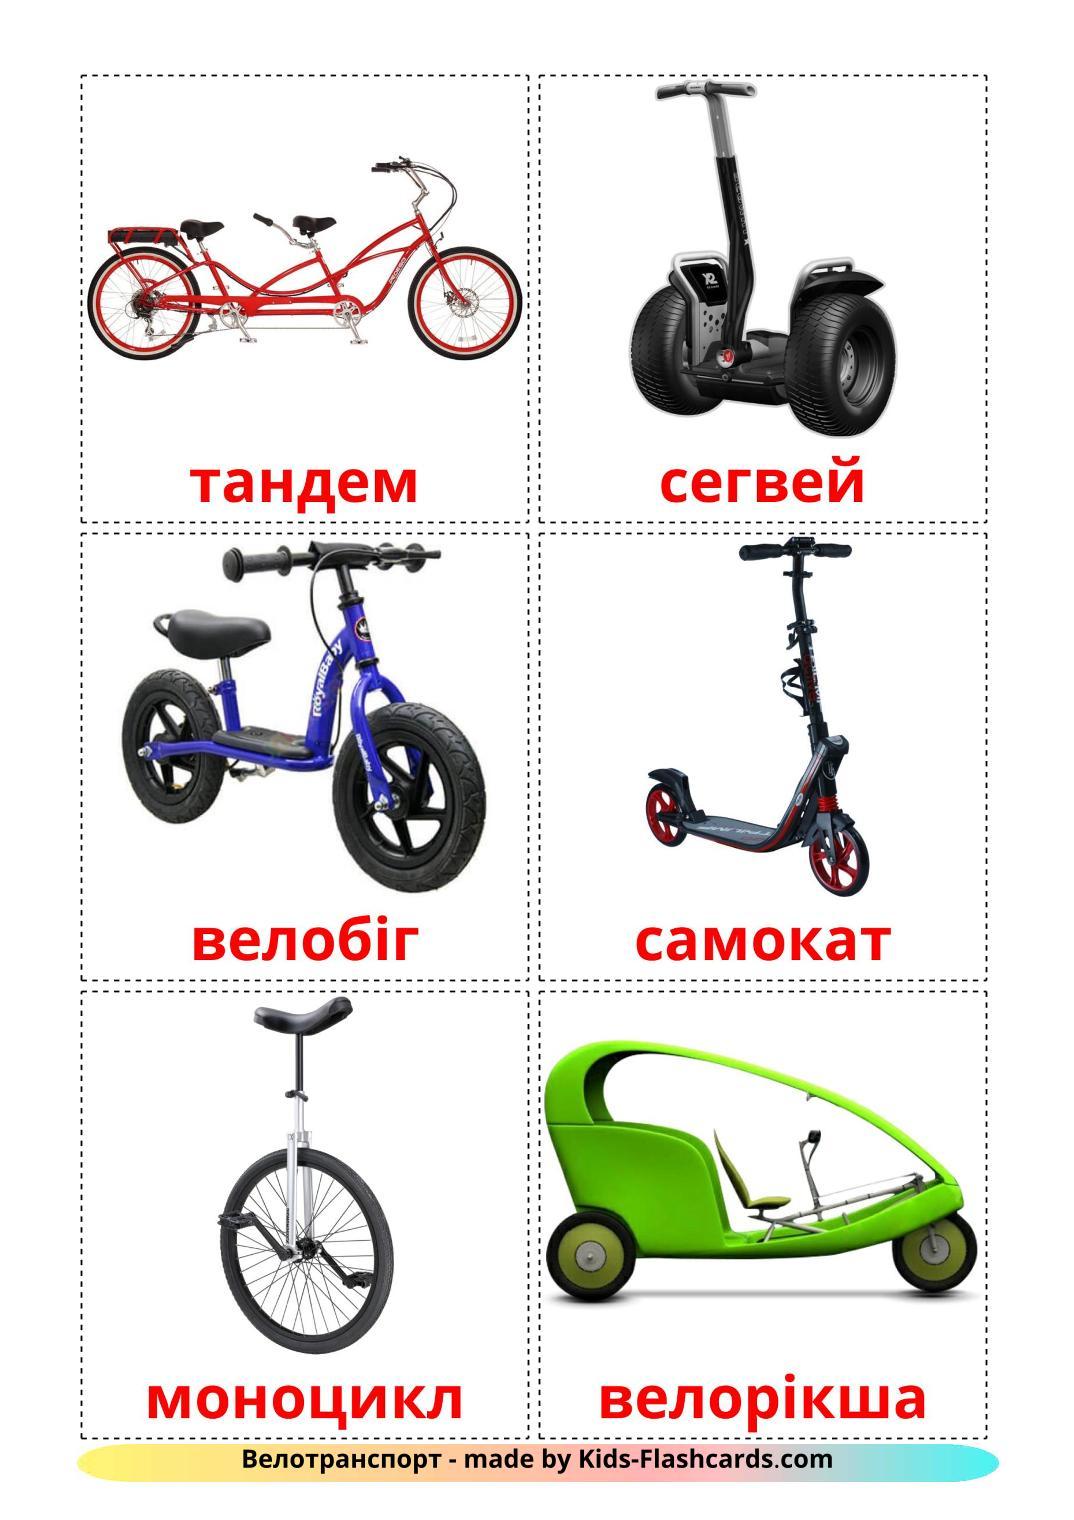 Bicycle transport - 16 Free Printable ukrainian Flashcards